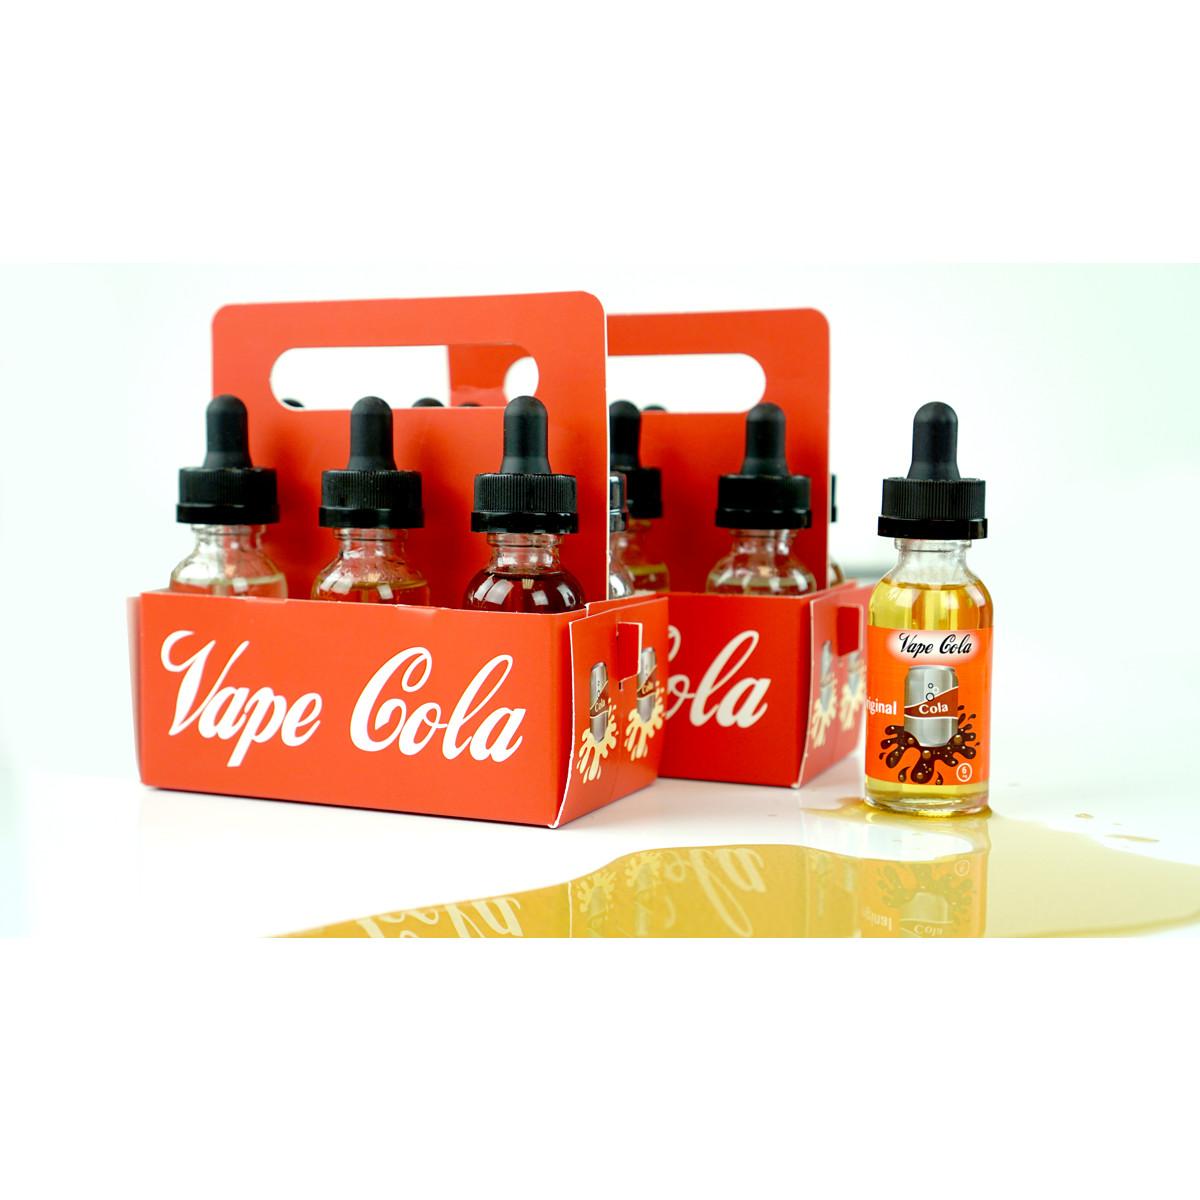 Vape Cola Flavor's